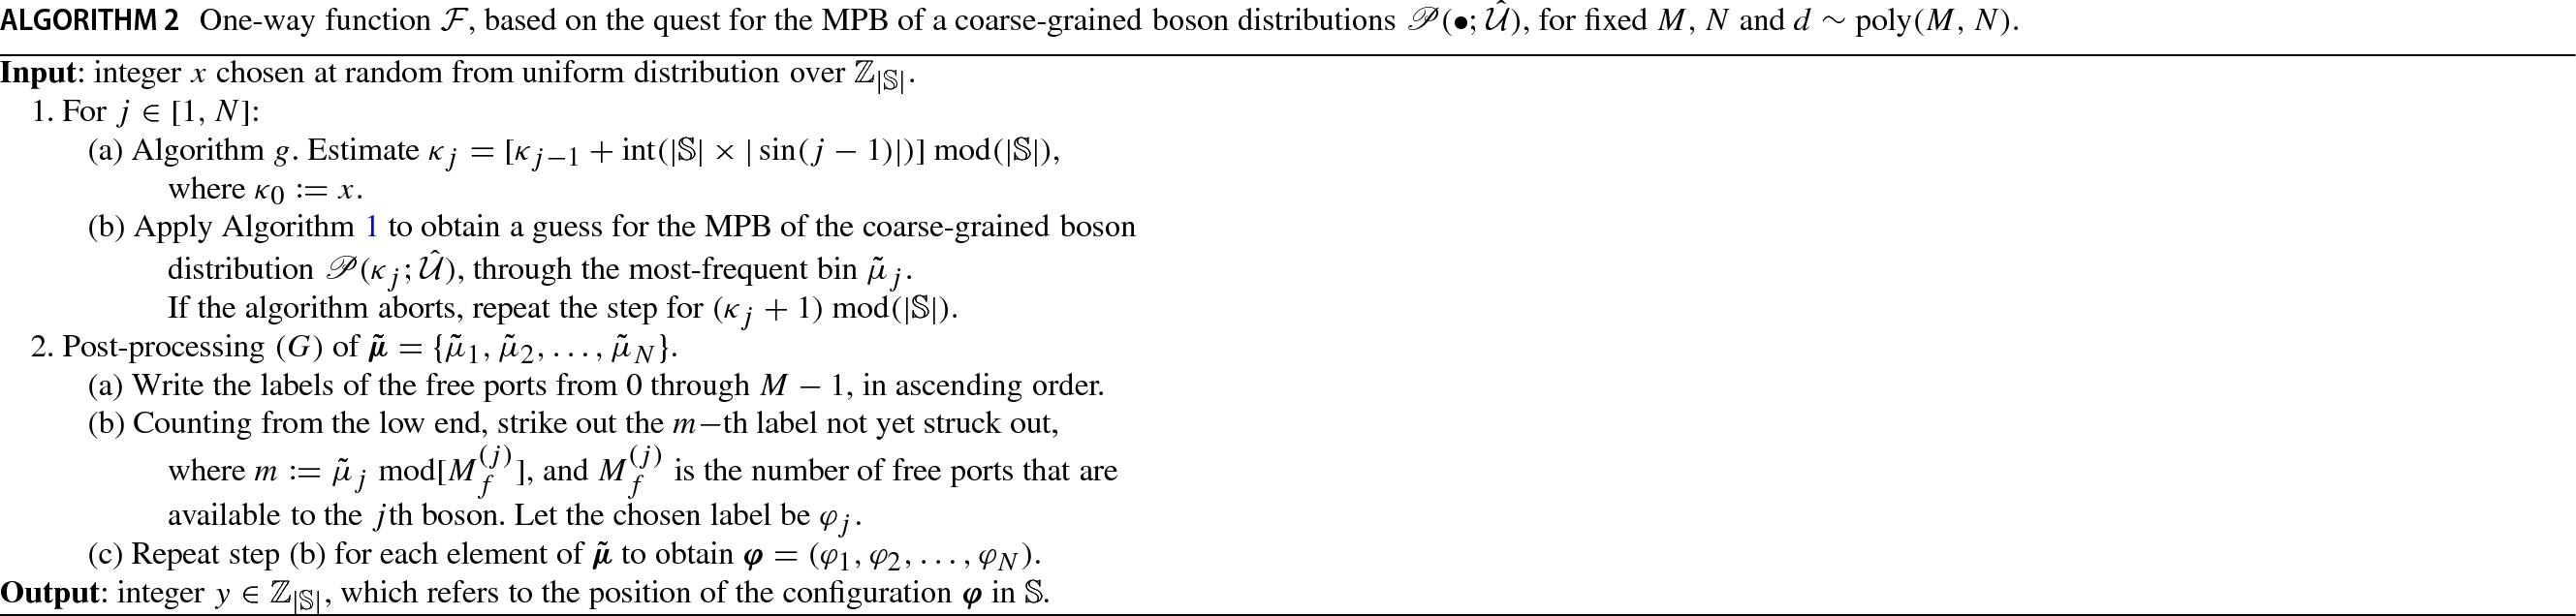 Cryptographic one-way function based on boson sampling | SpringerLink